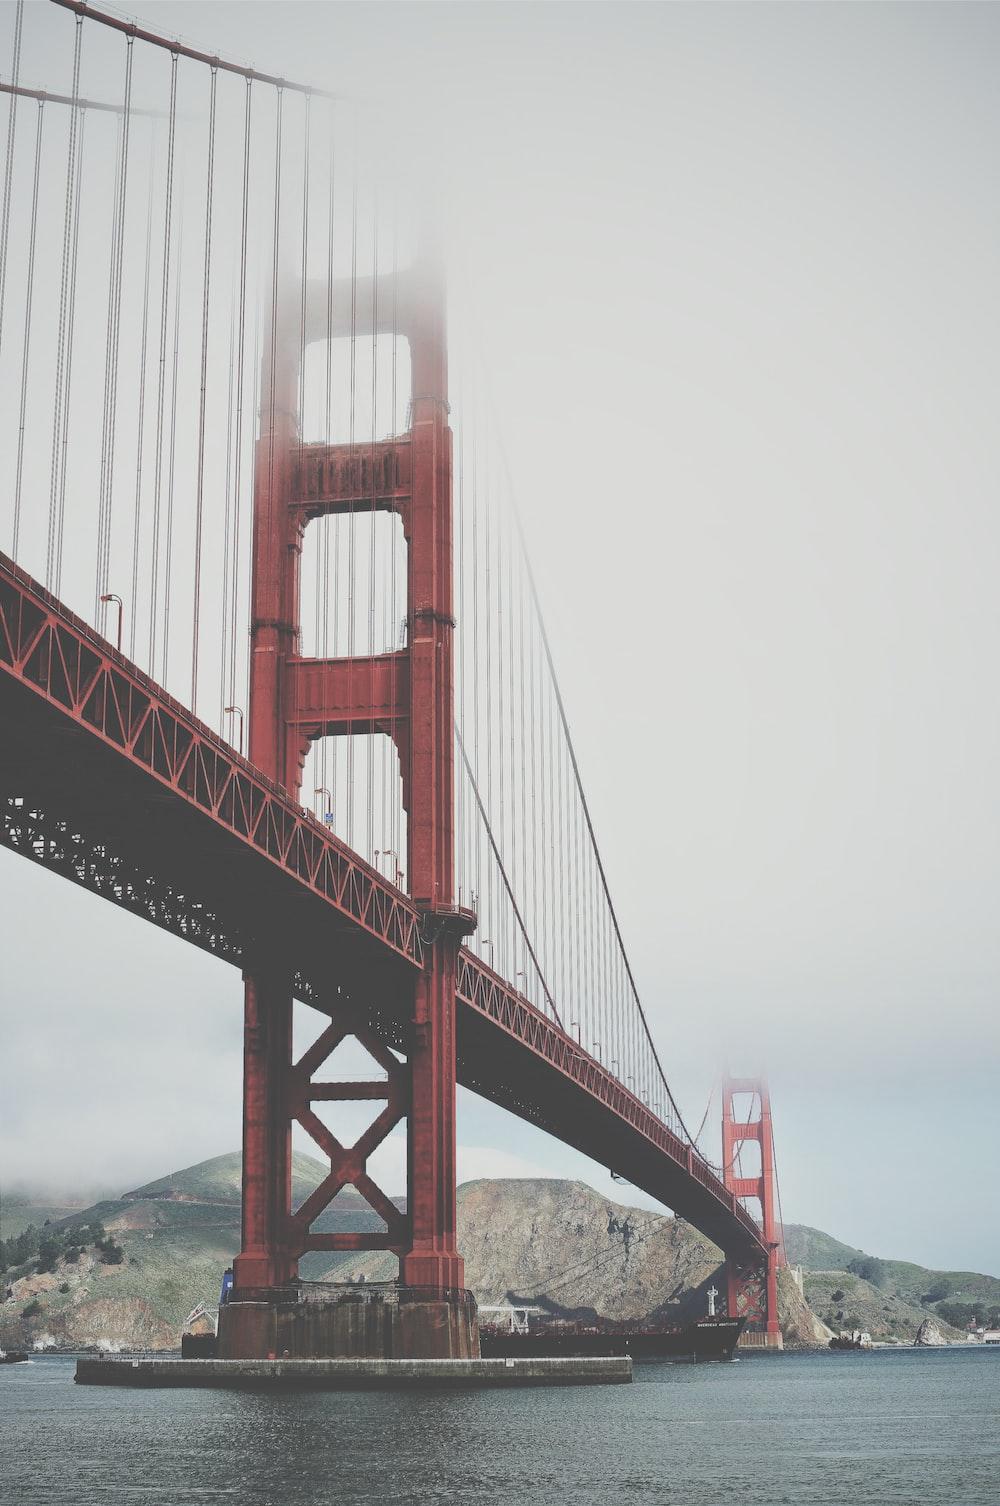 Golden Gate Bridge under blue sky at daytime